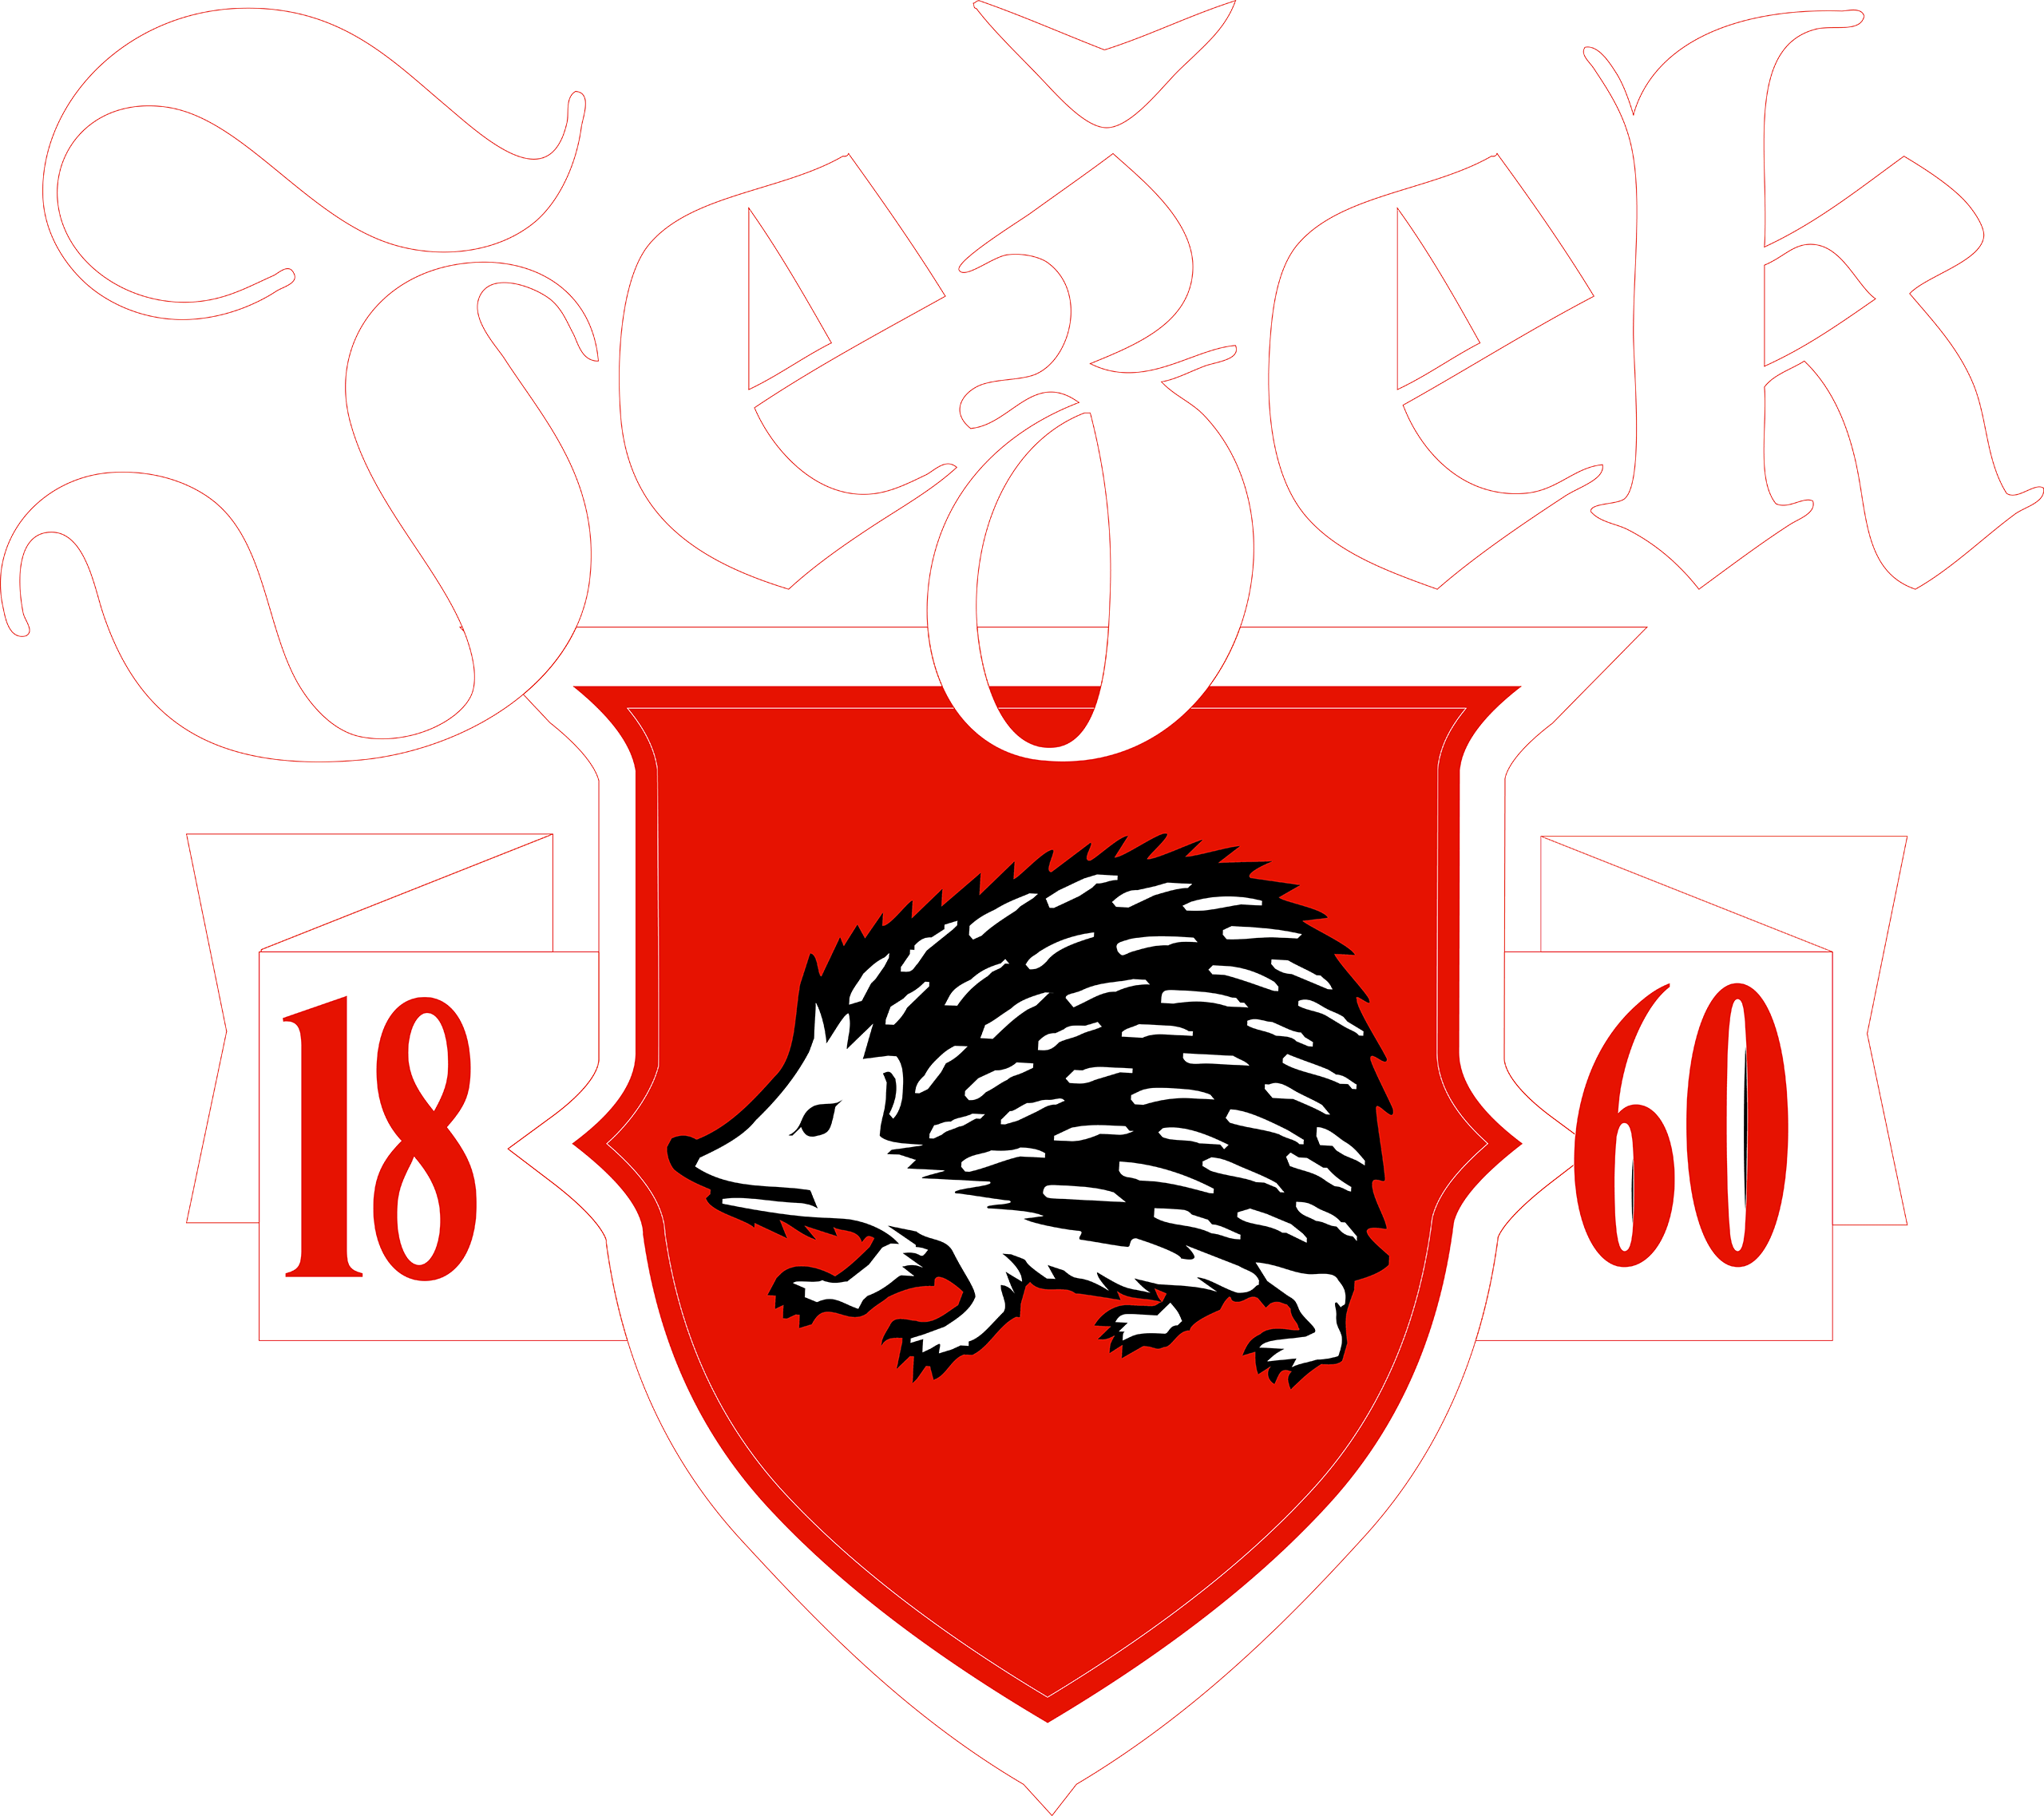 Pivovar Ježek